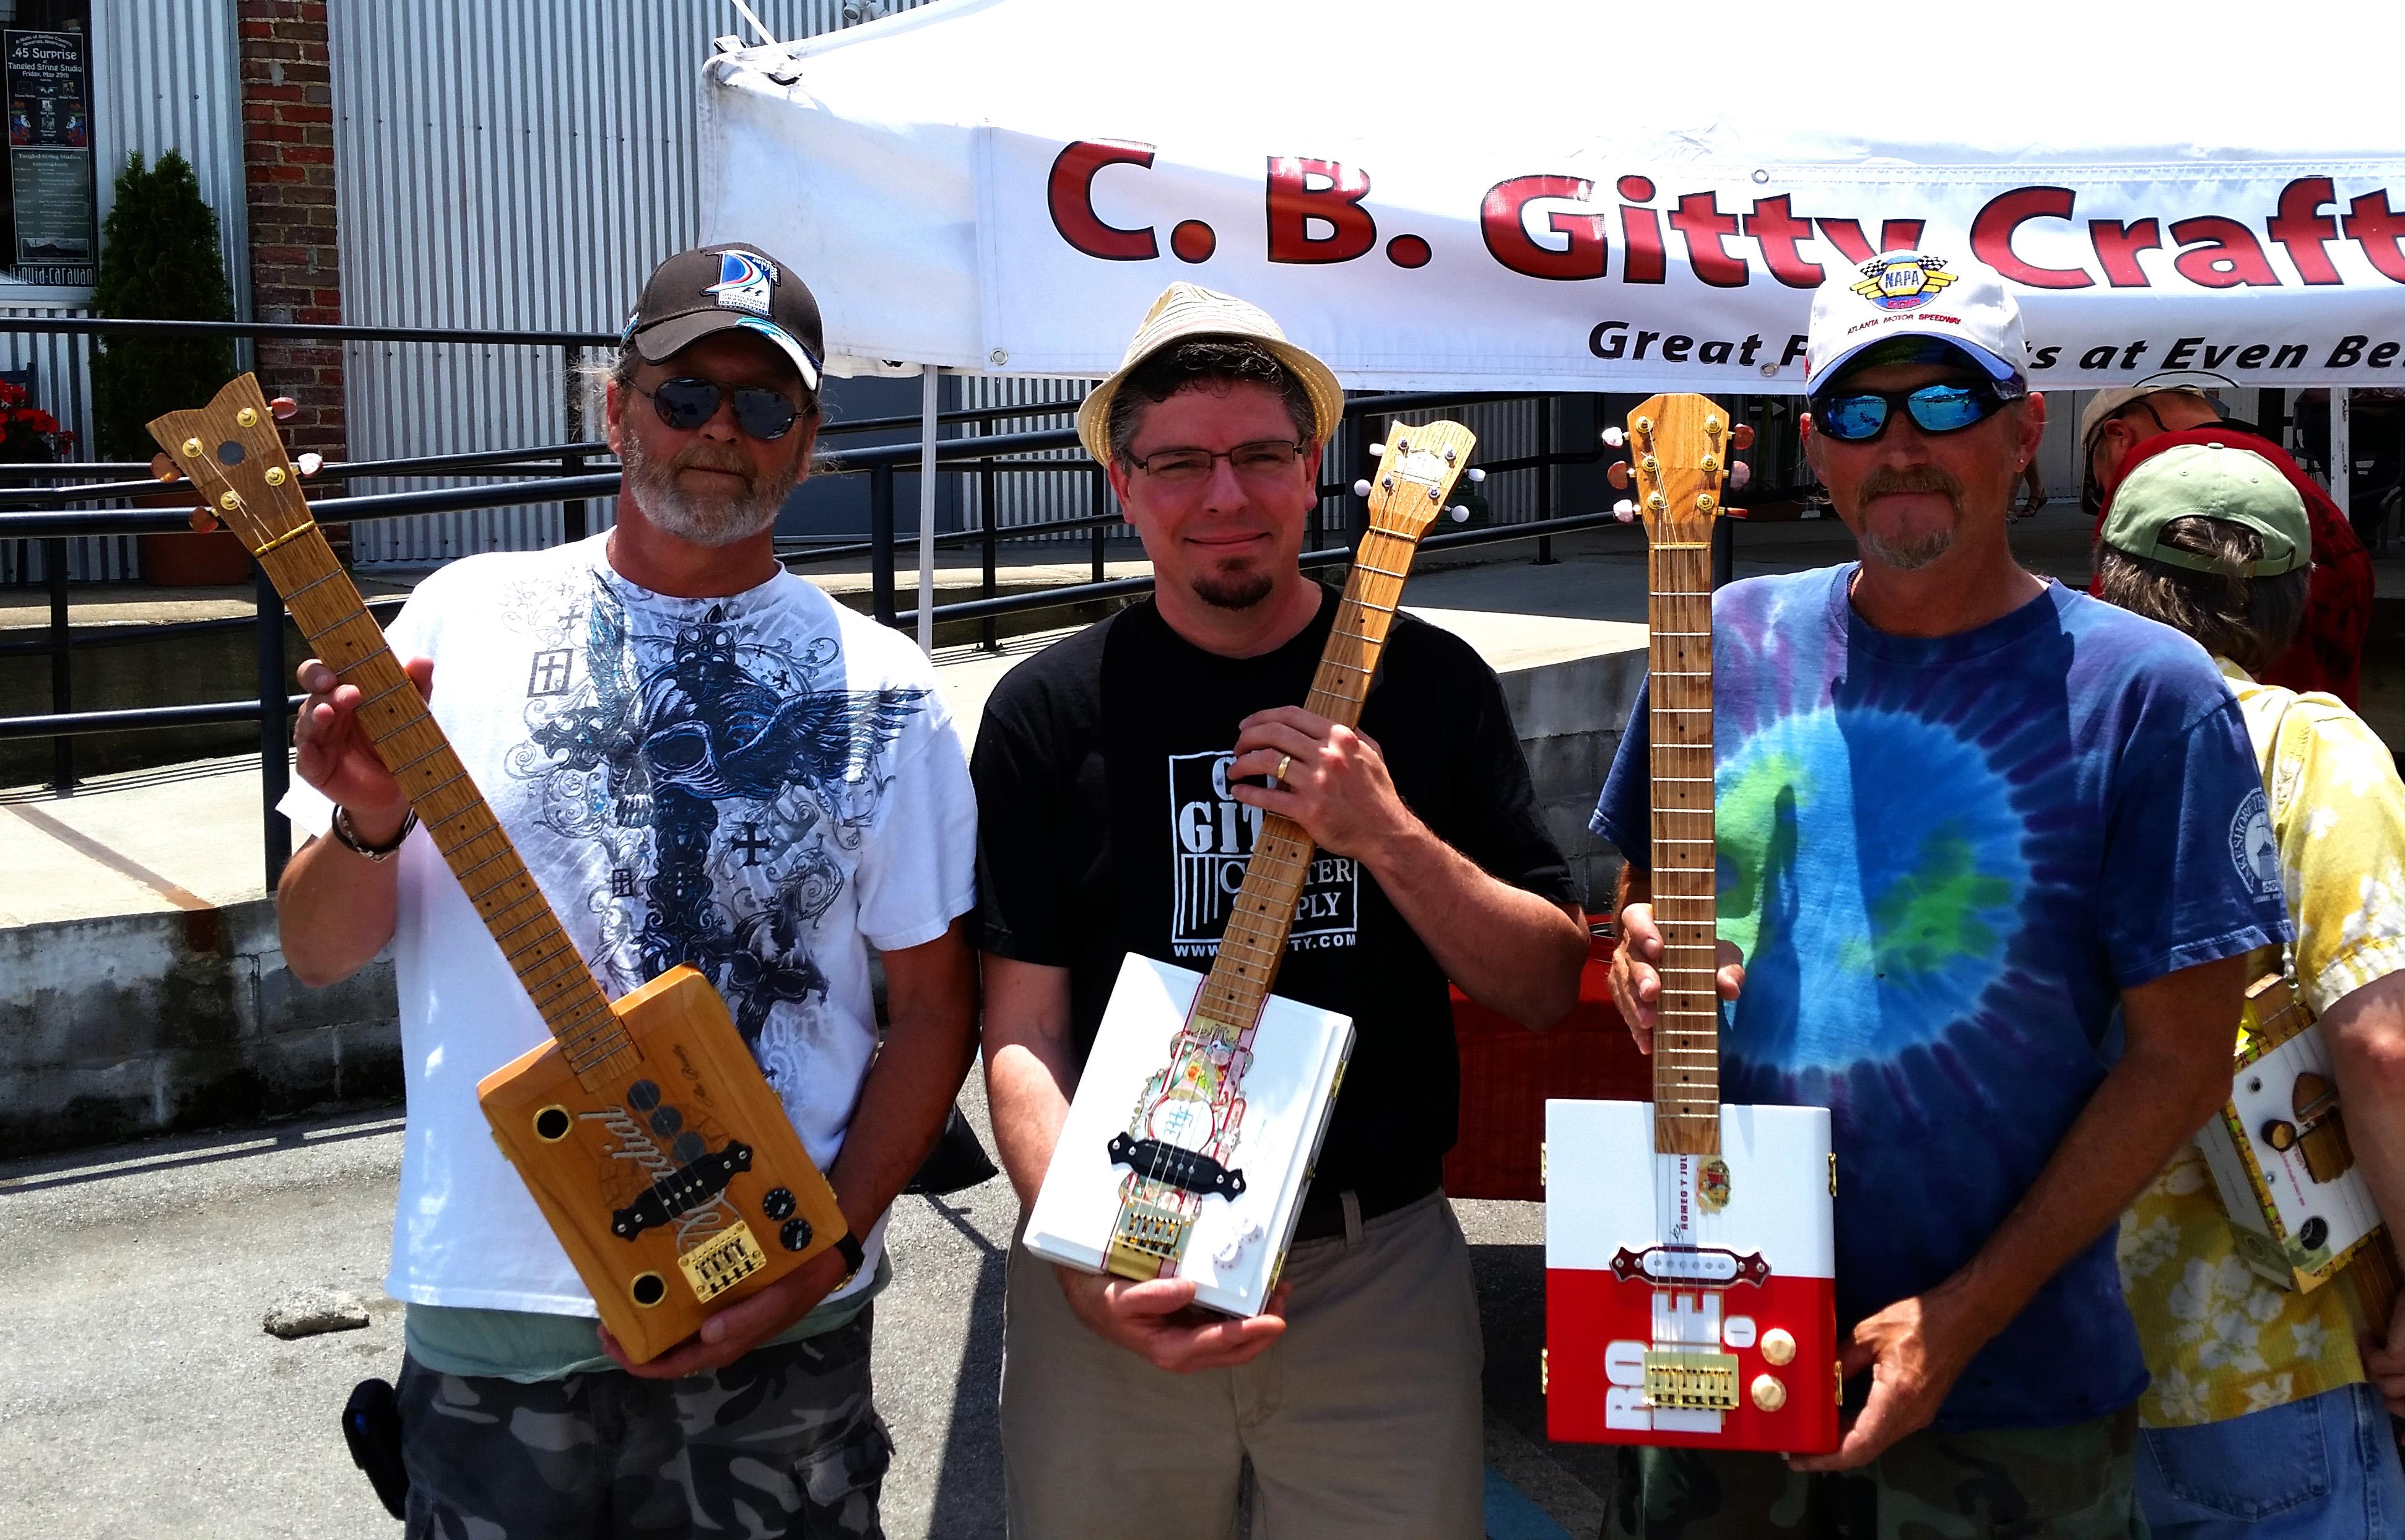 Keith DeArmond, Gitty and Jeff Mooneyham